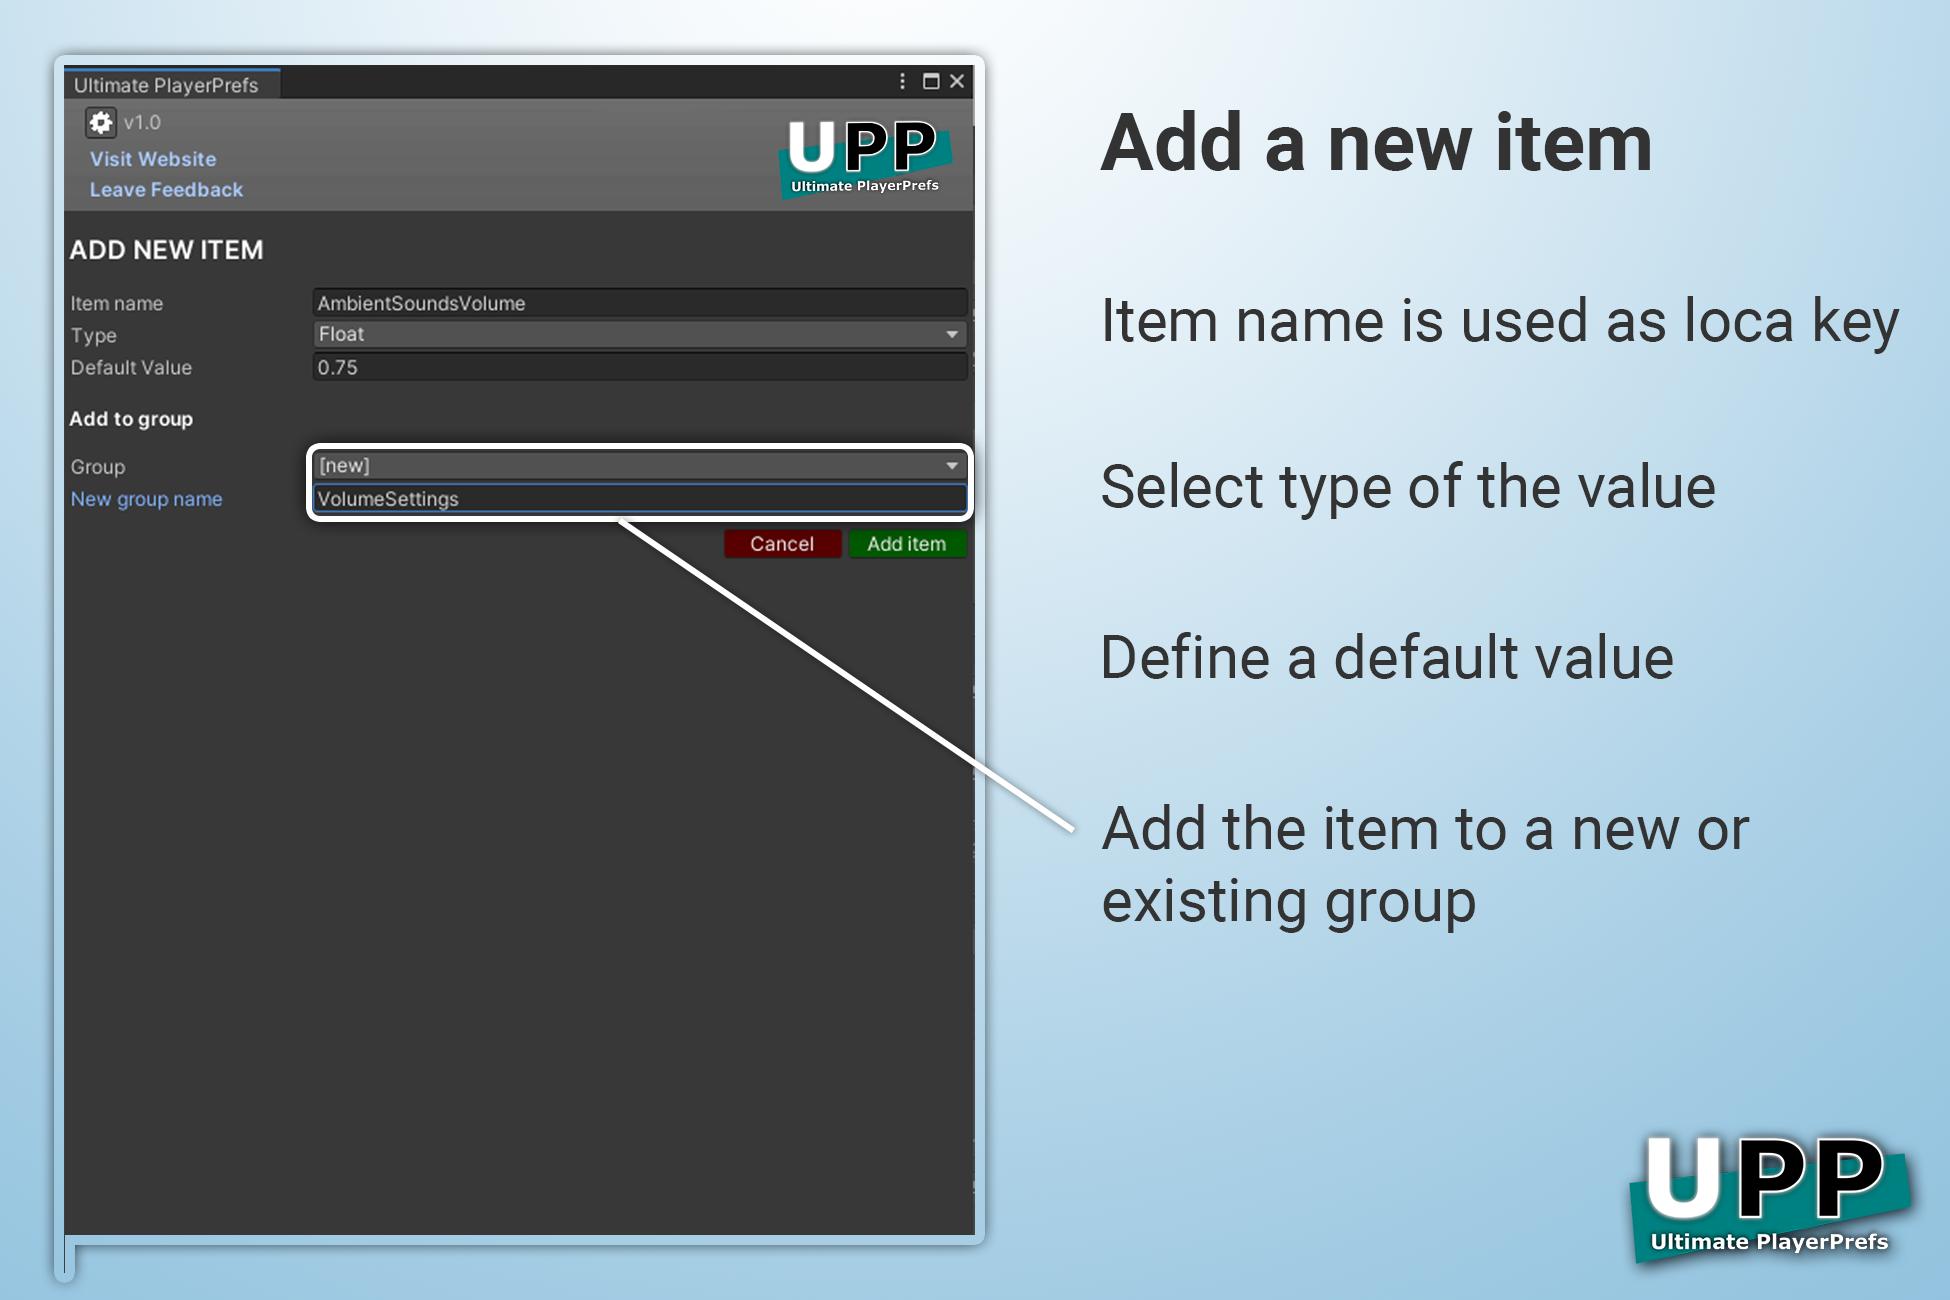 ultimate-playerprefs_add-new-item.png